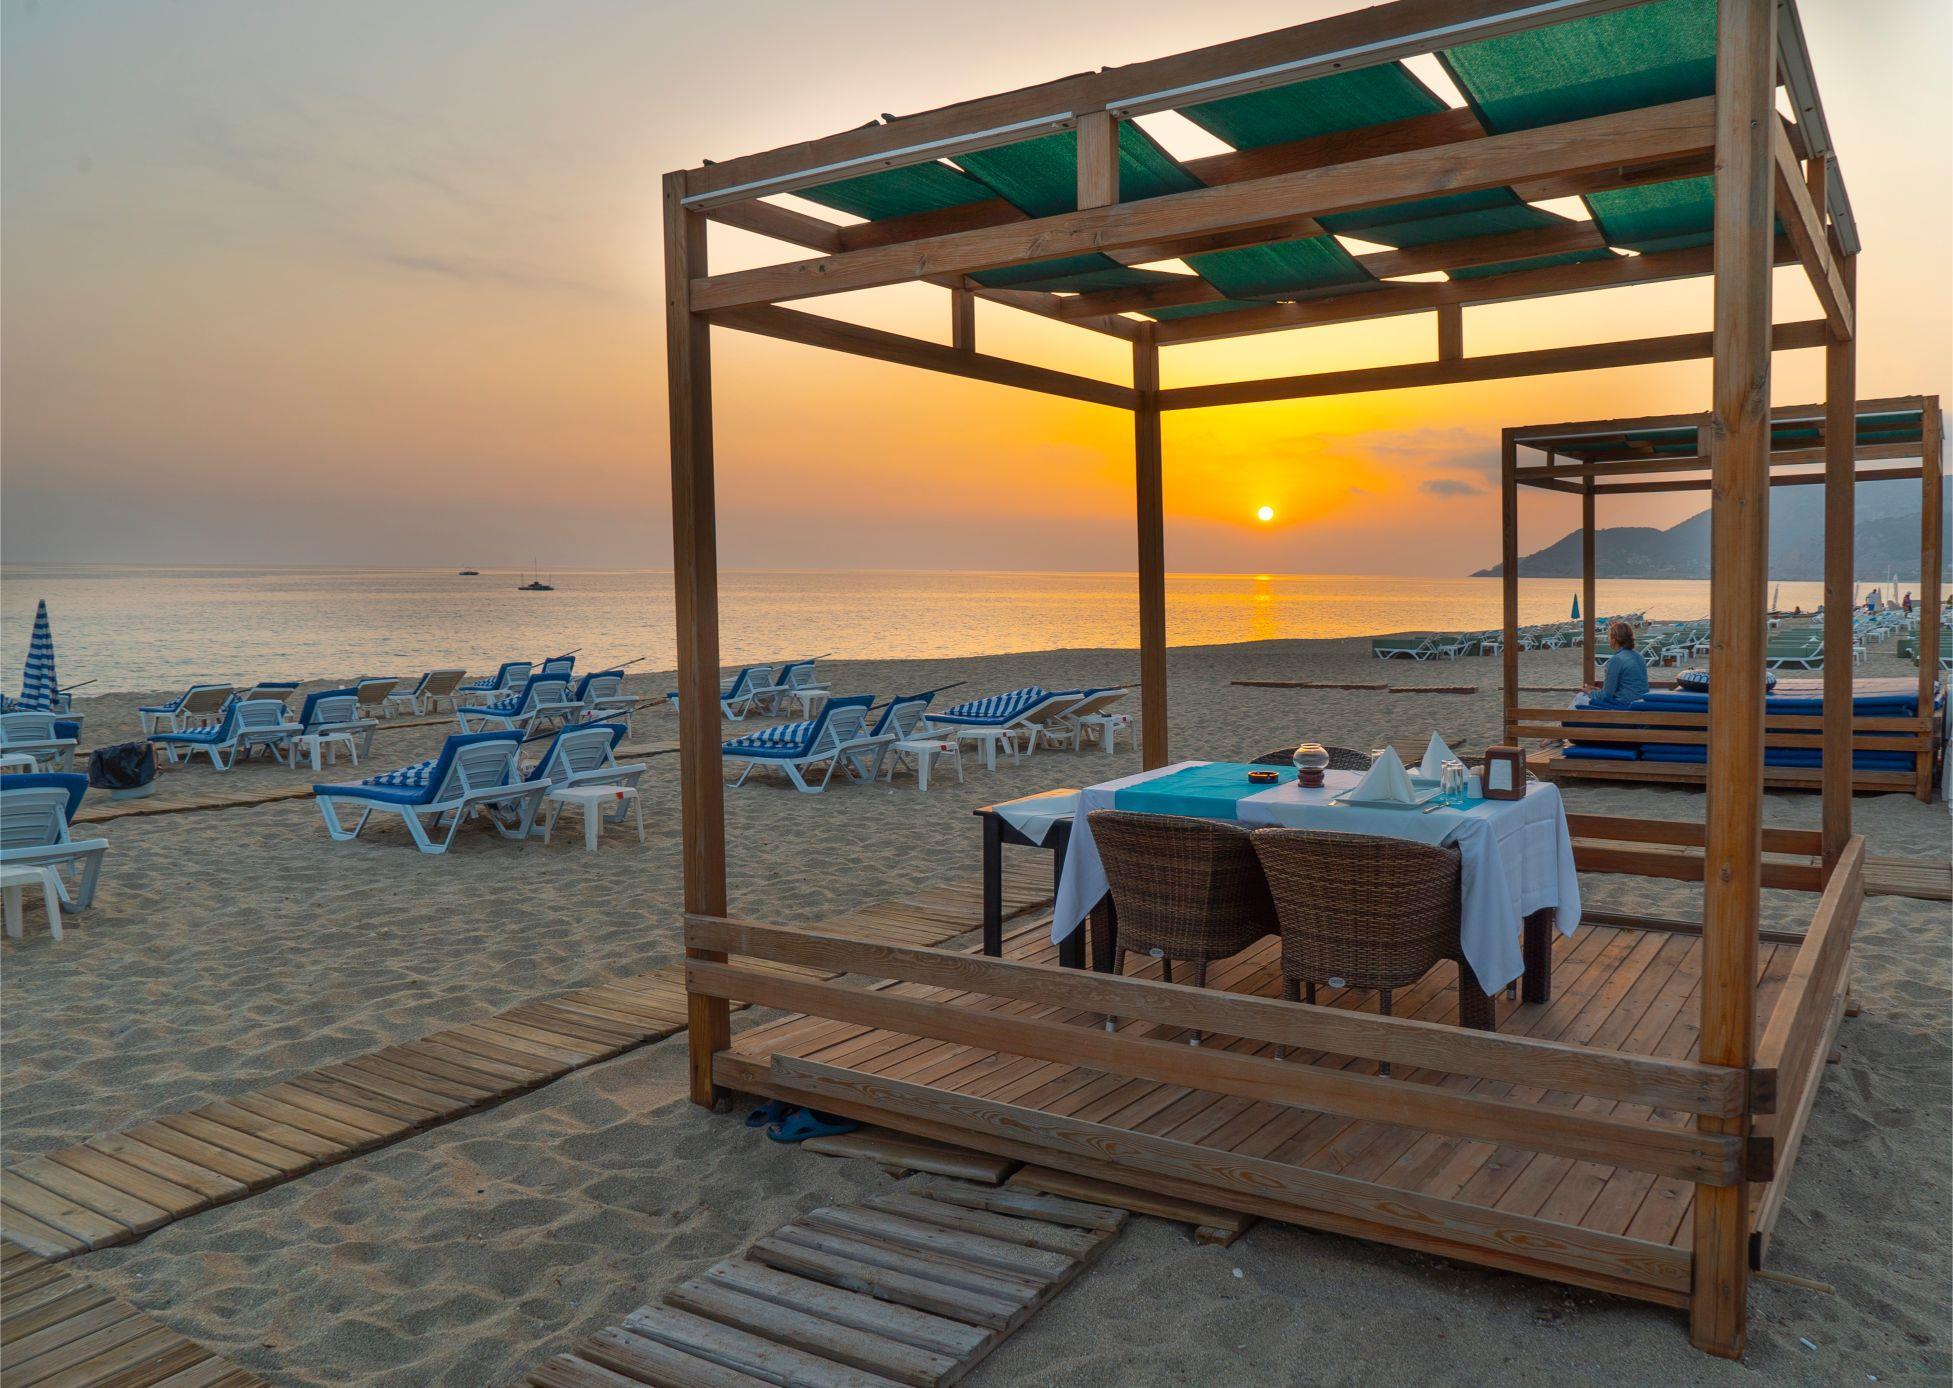 http://www.orextravel.sk/OREX/hotelphotos/azak-beach-general-0026.jpg